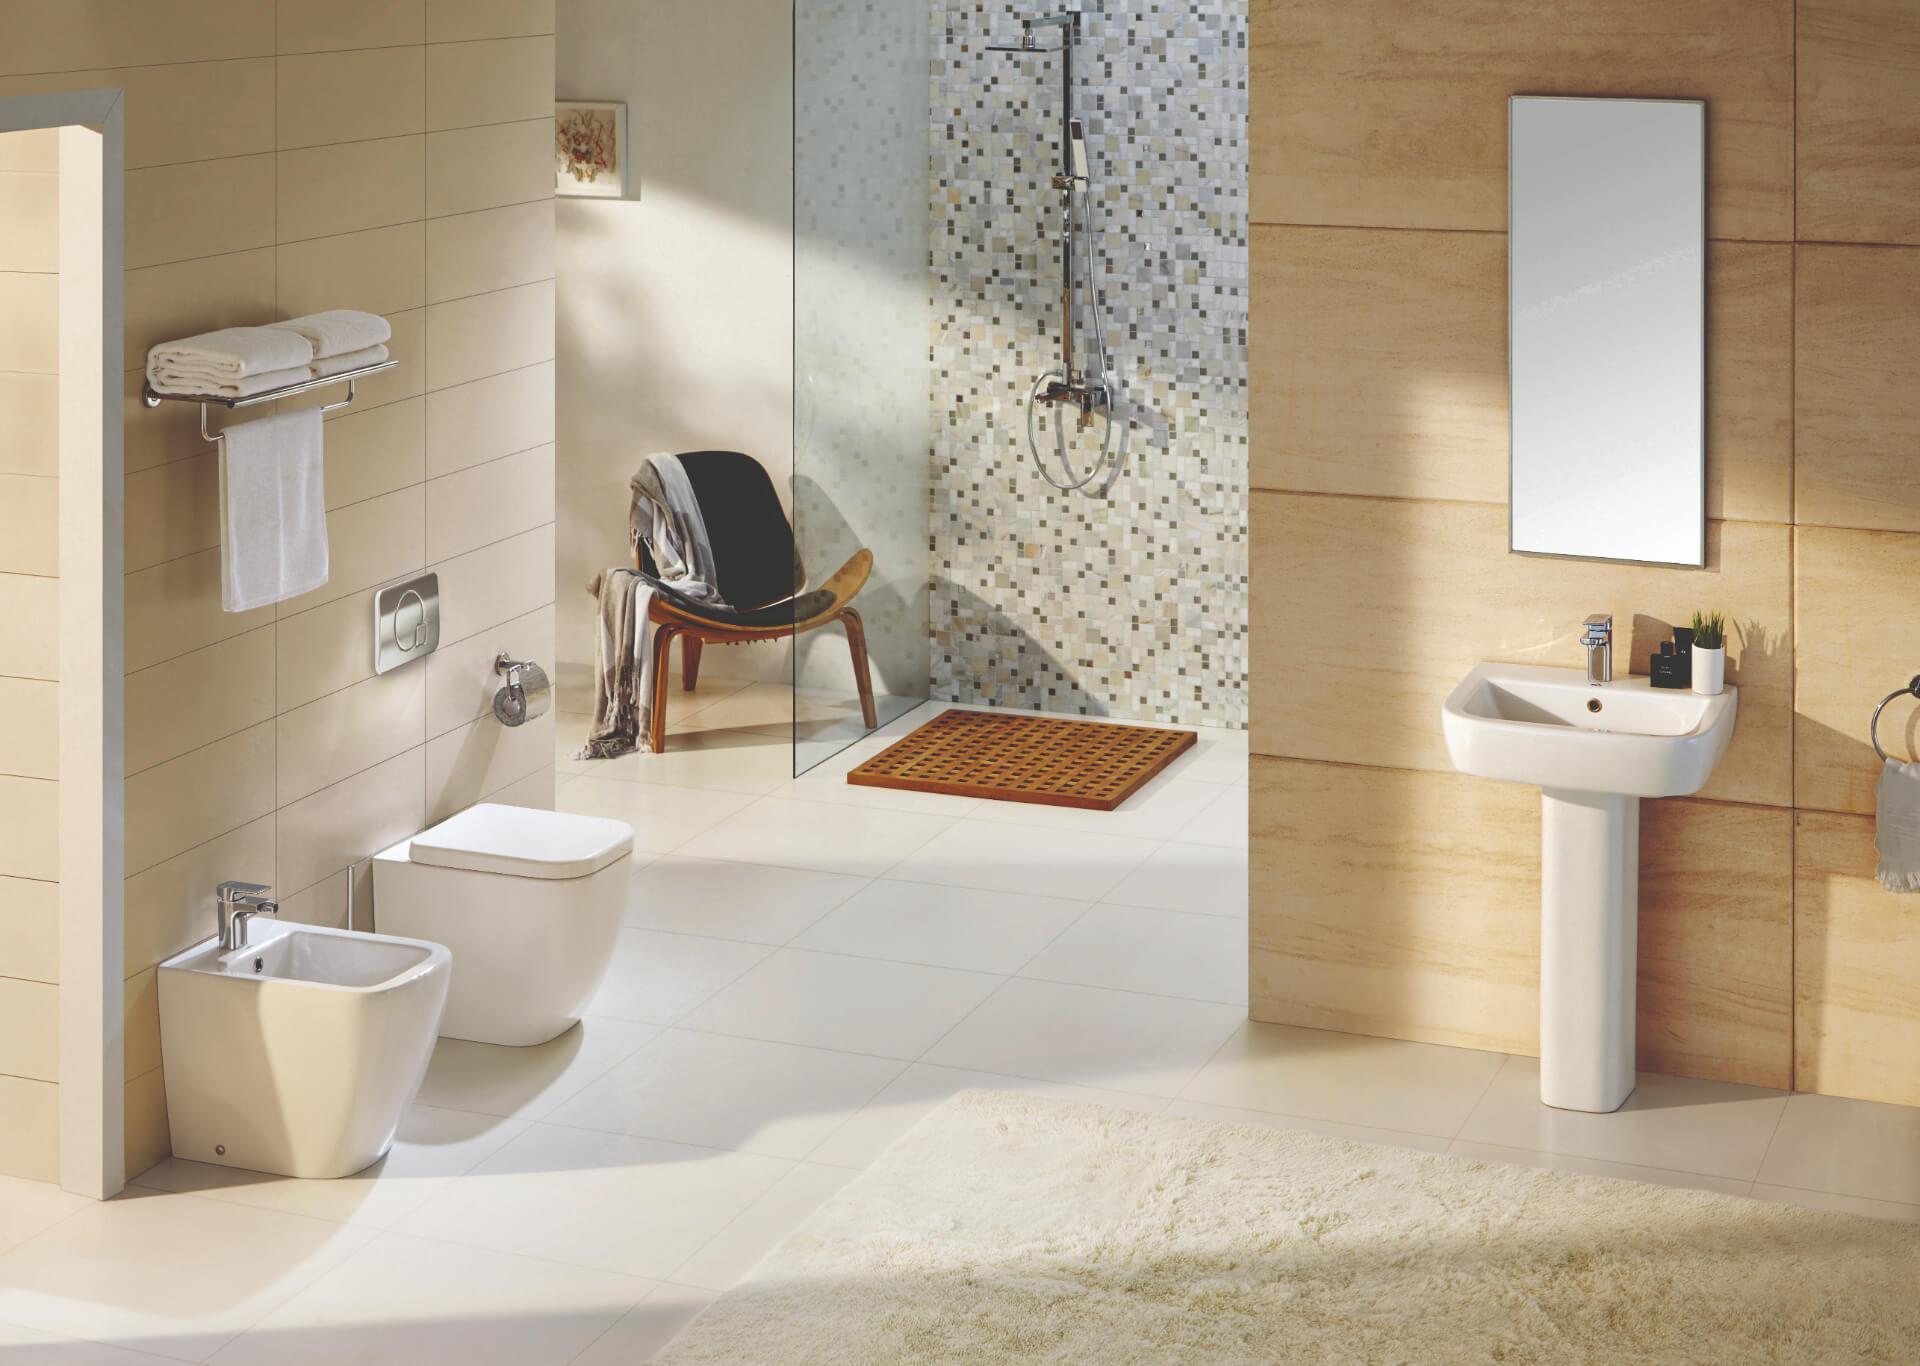 Modern Sanitary Wear in Bathroom